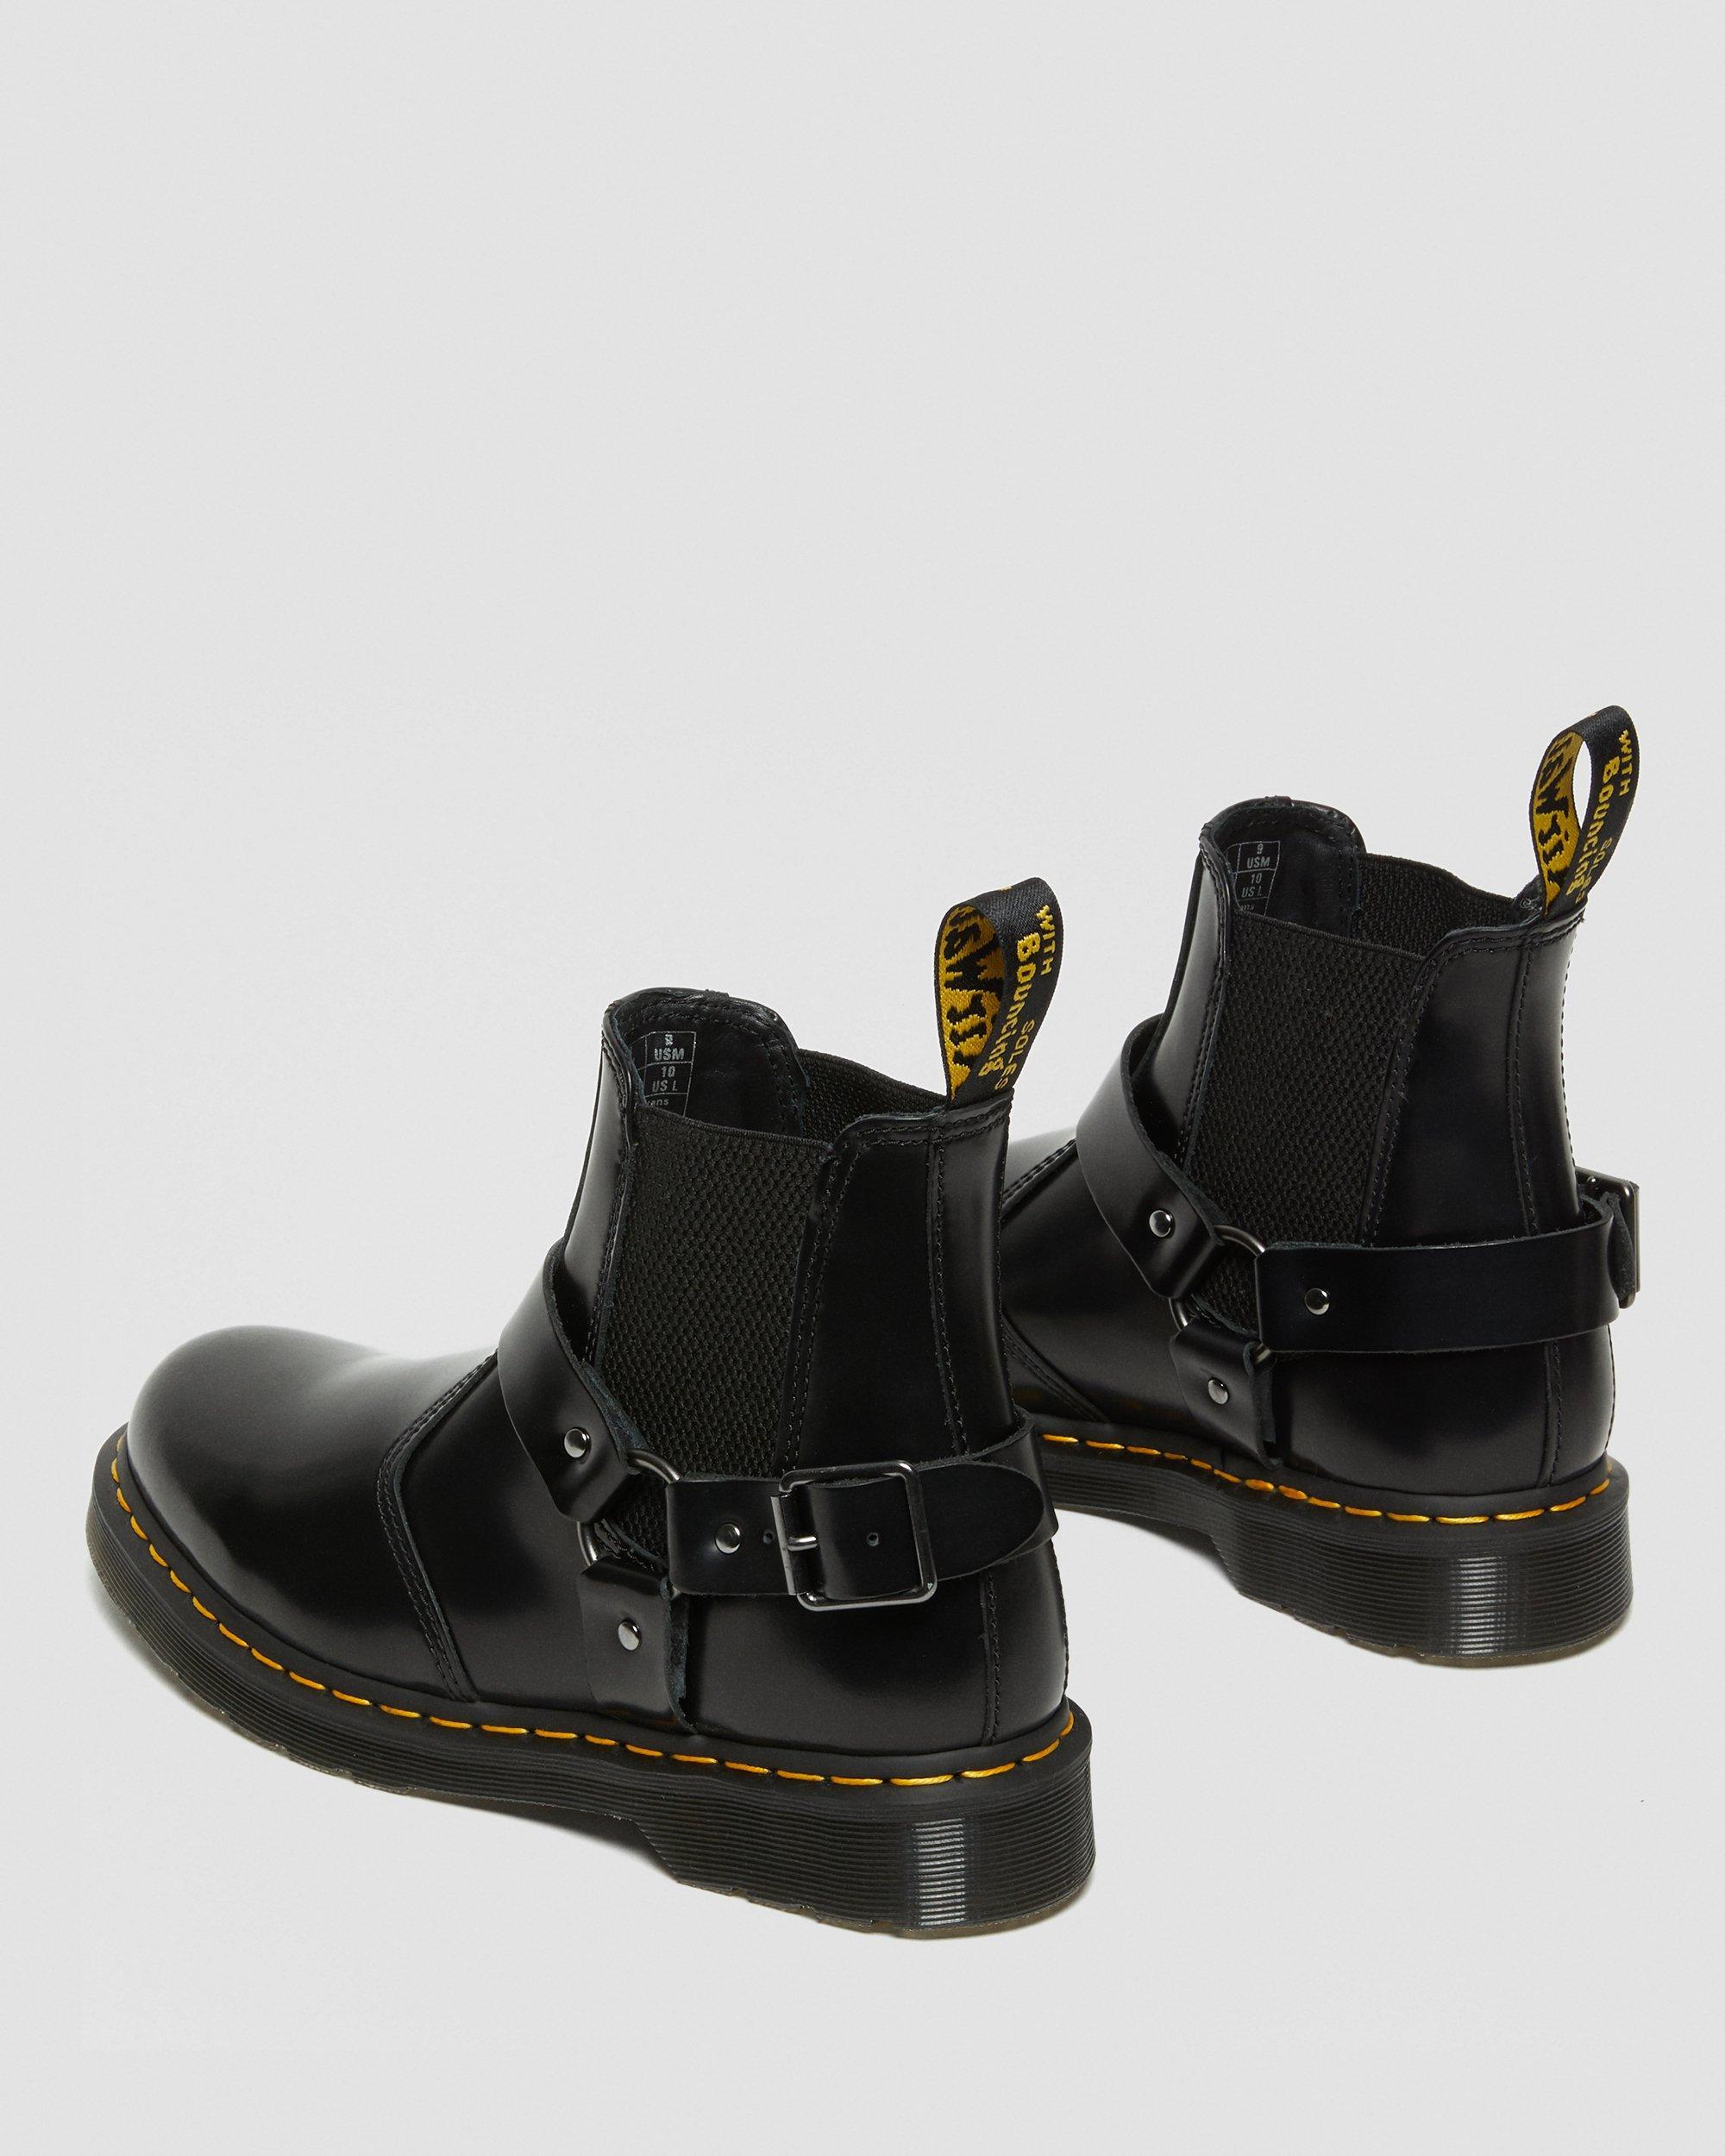 dr martens buckle strap boots